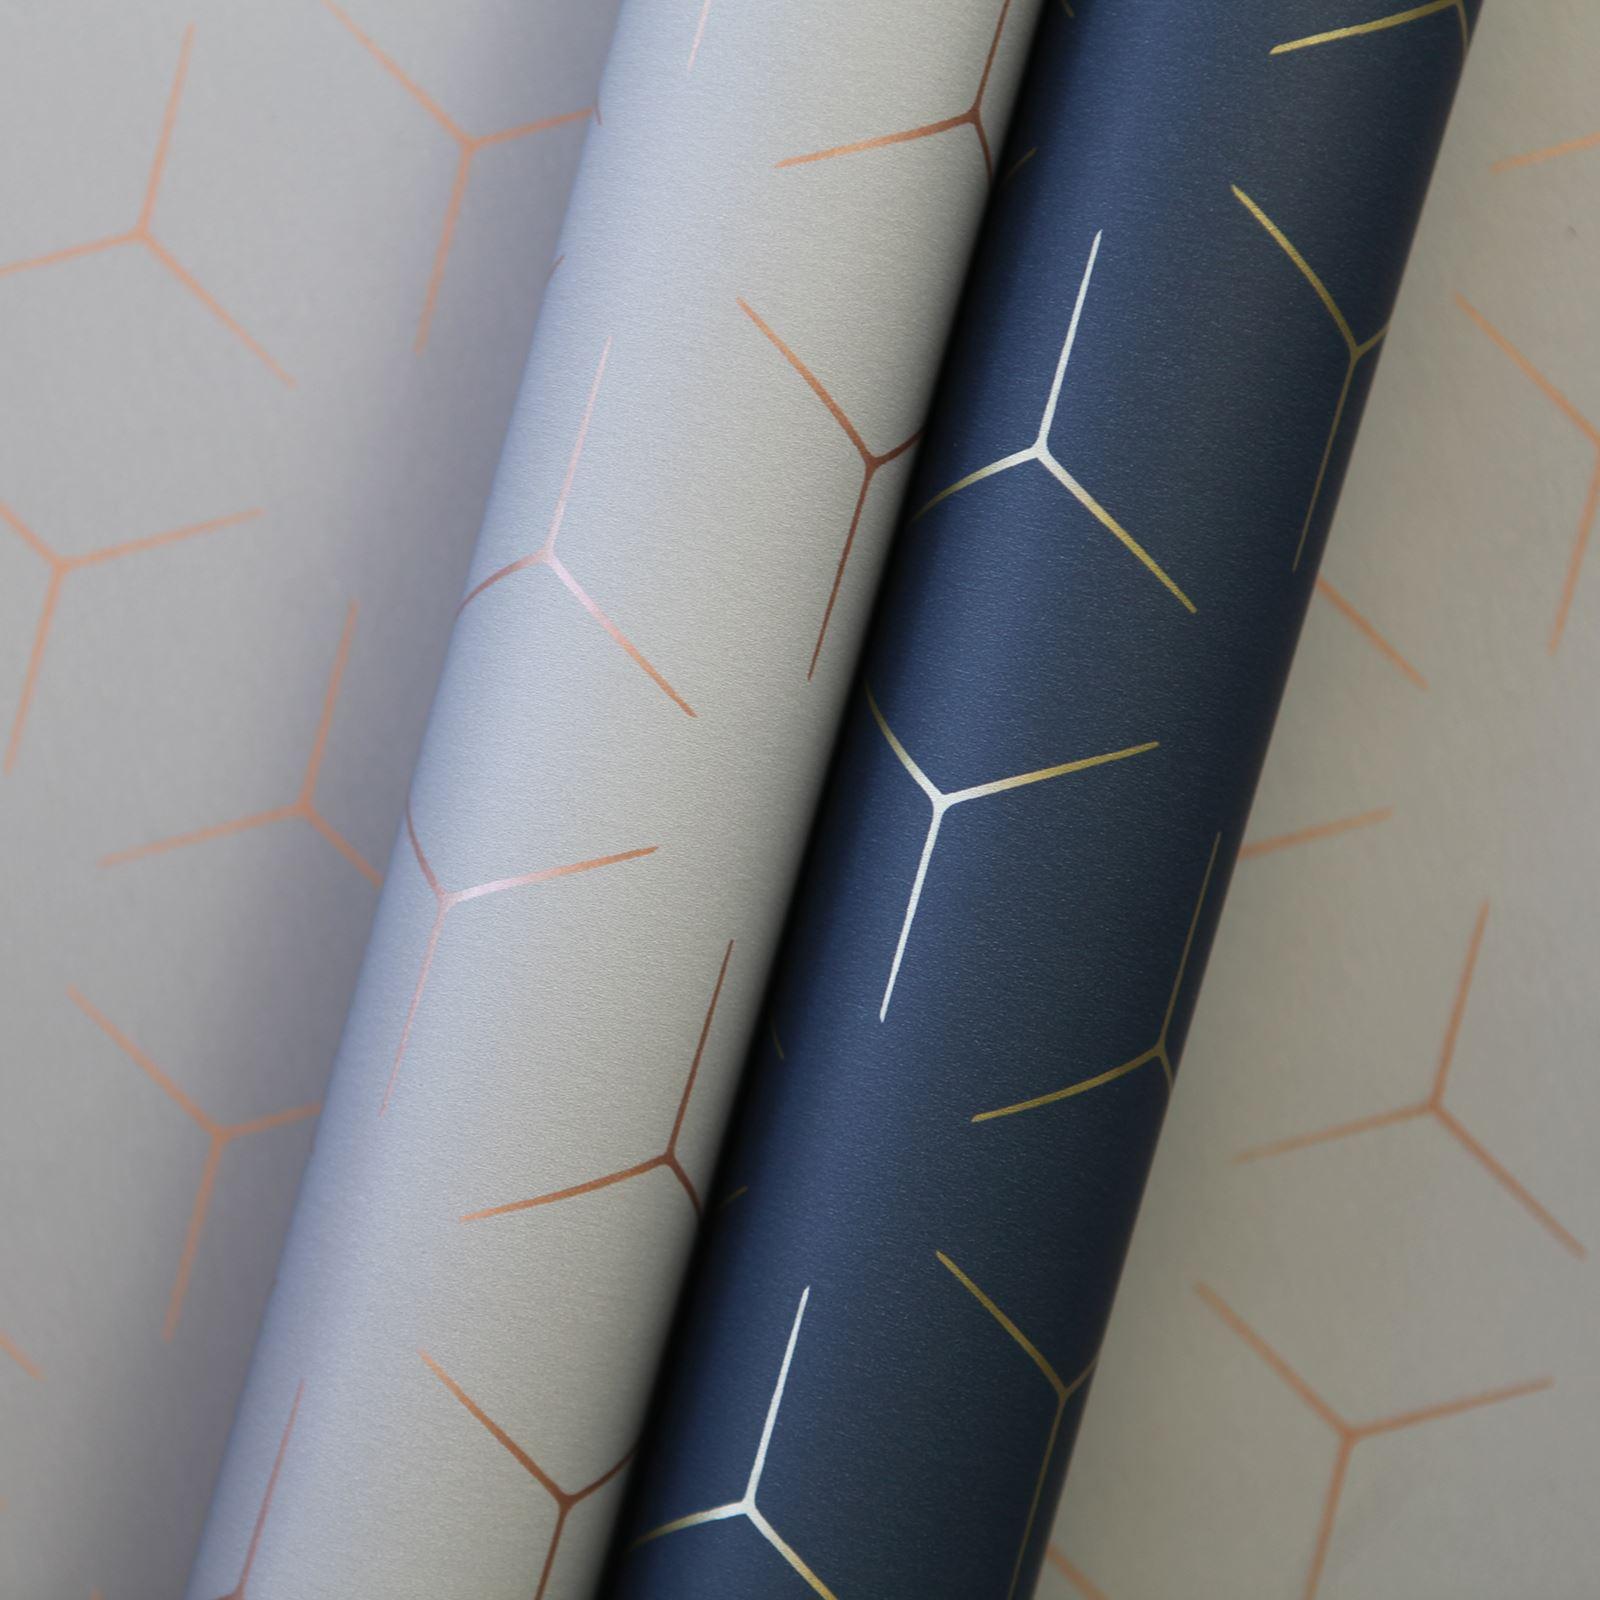 miniatura 76 - Carta da Parati Geometrica Arredamento Camera Moderno Vari Disegni e Colori